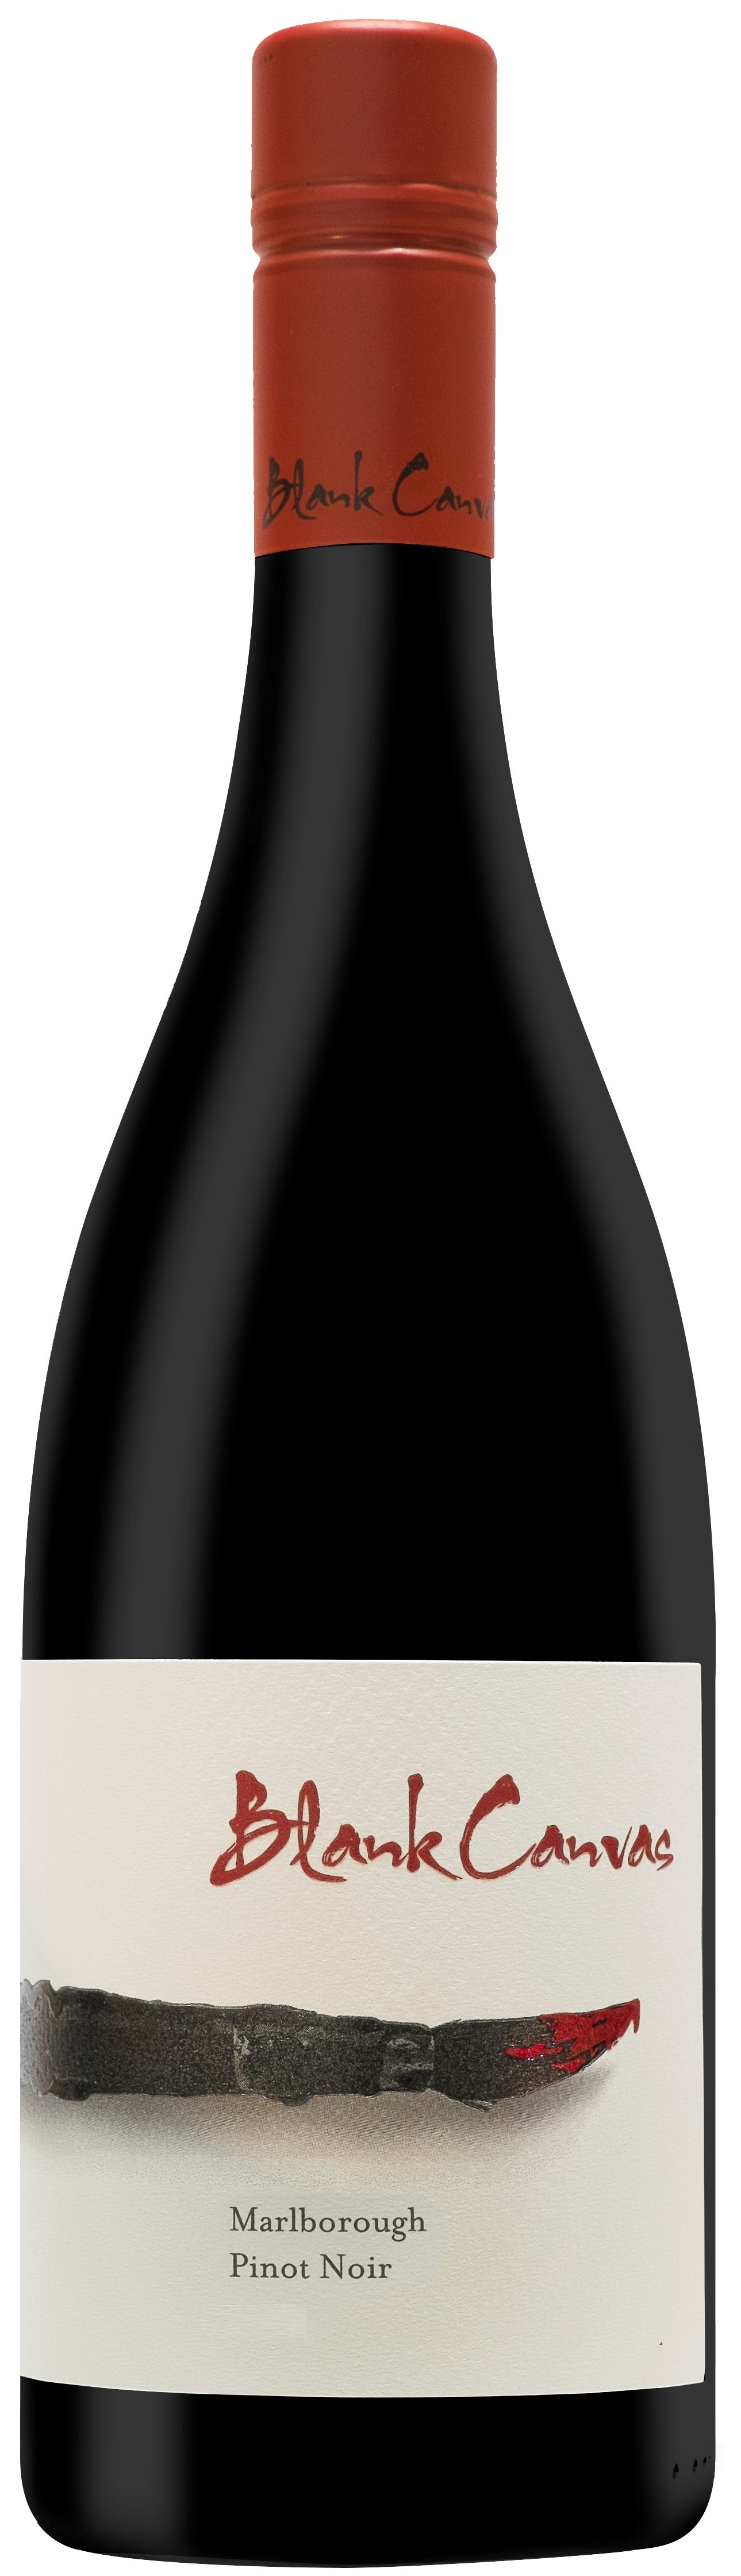 Blank Canvas, Marlborough Pinot Noir 2014